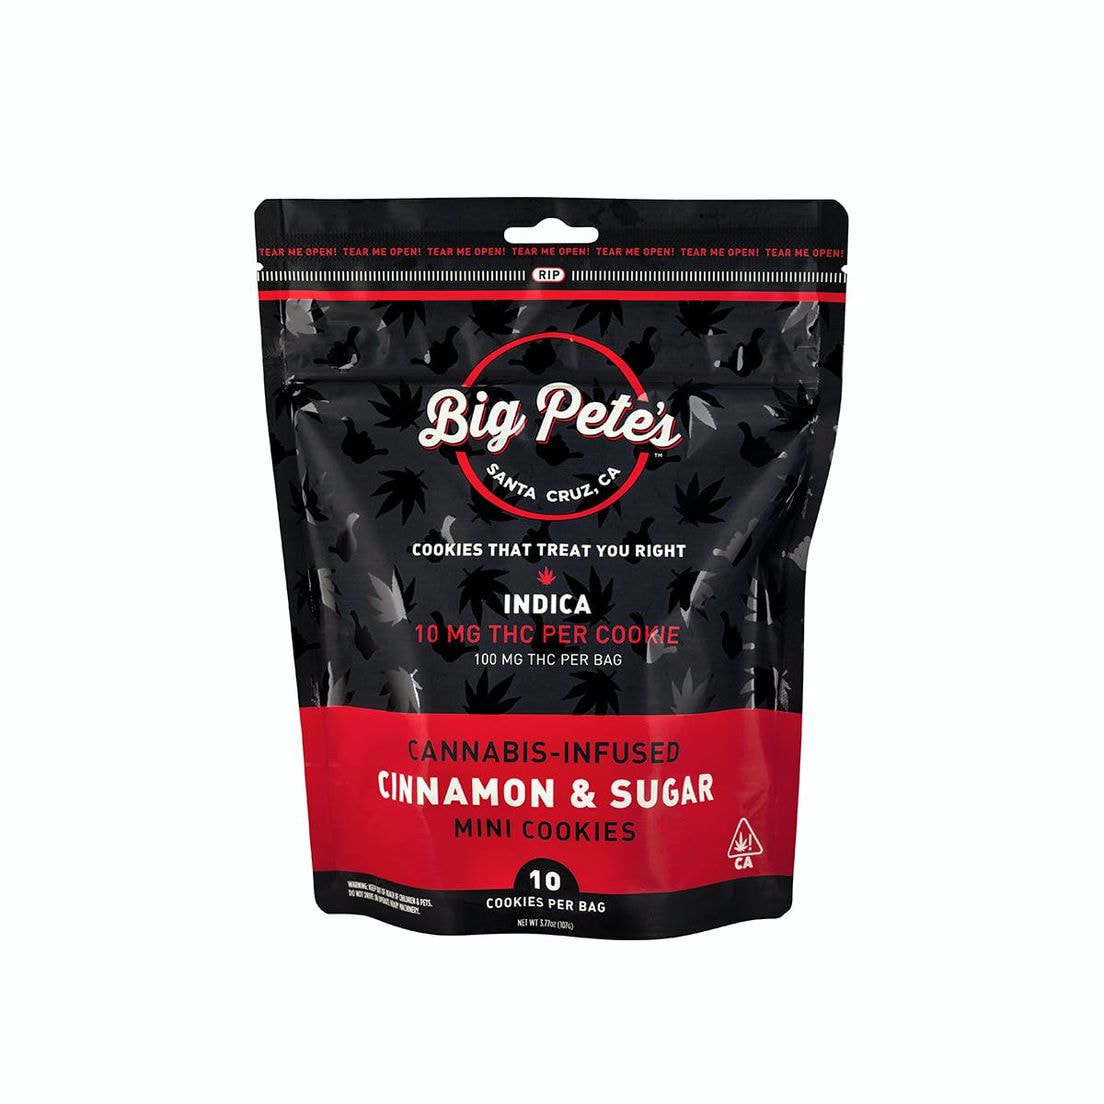 [Big Petes Treats] THC Cookies - 100mg - Cinnamon Sugar (I)